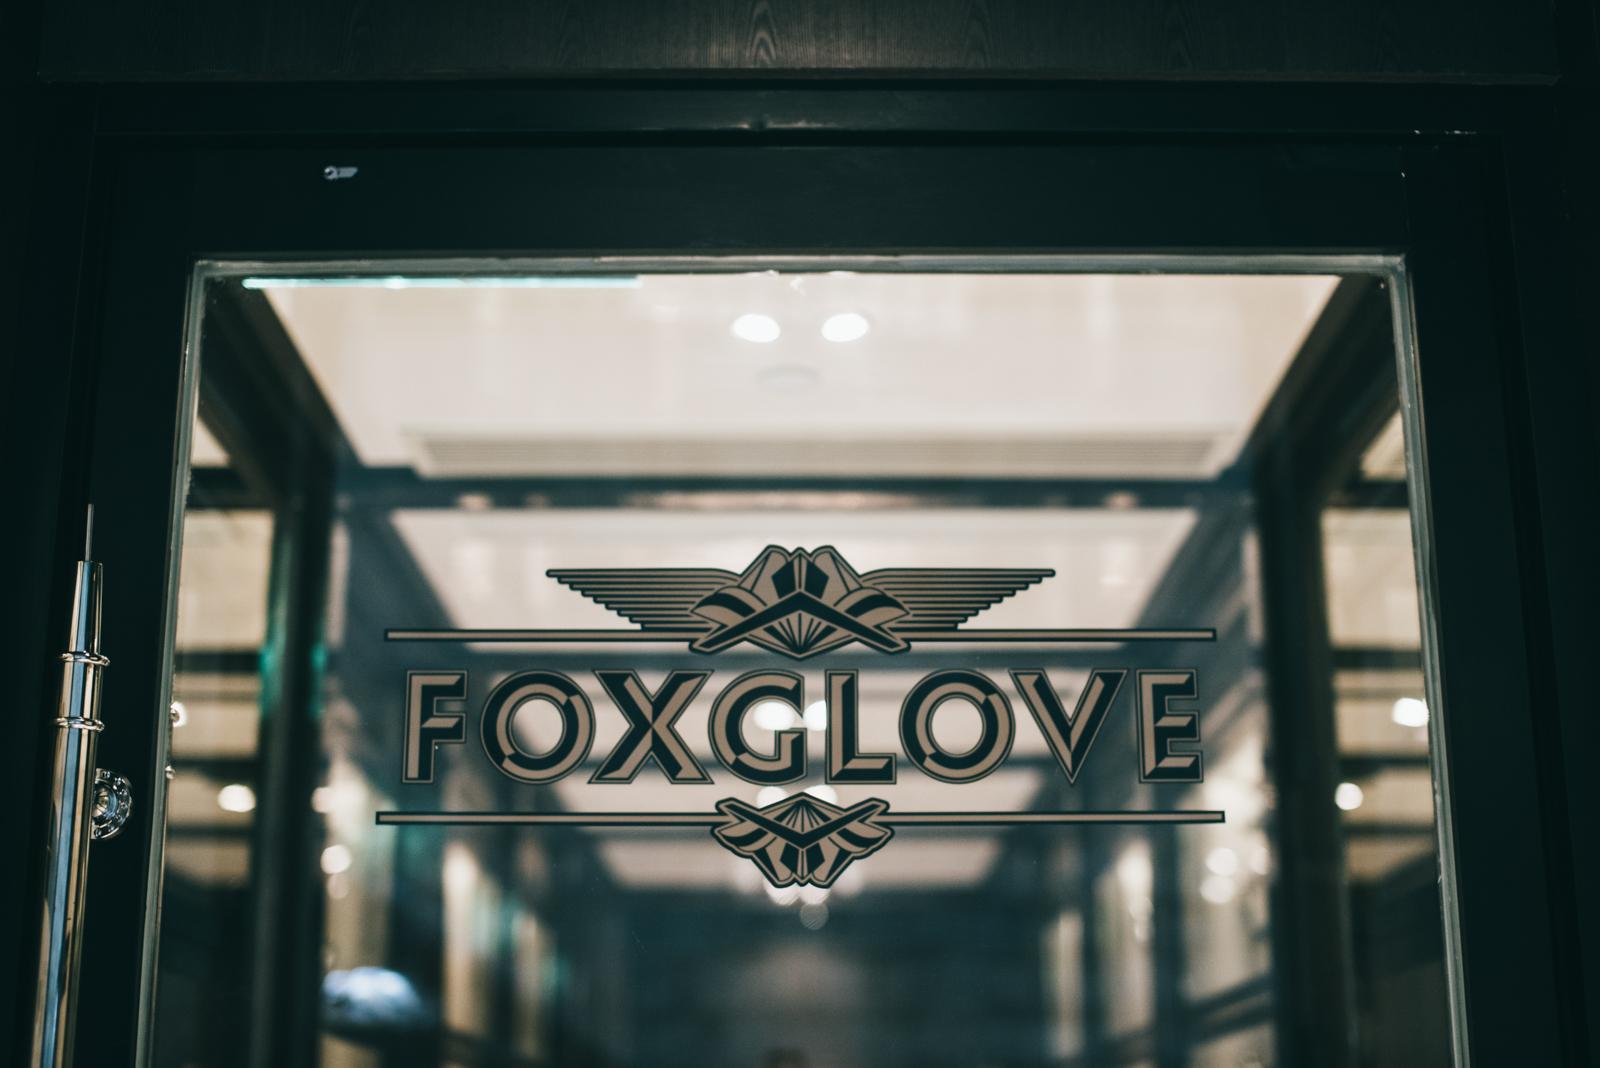 Foxglove, 2015-16